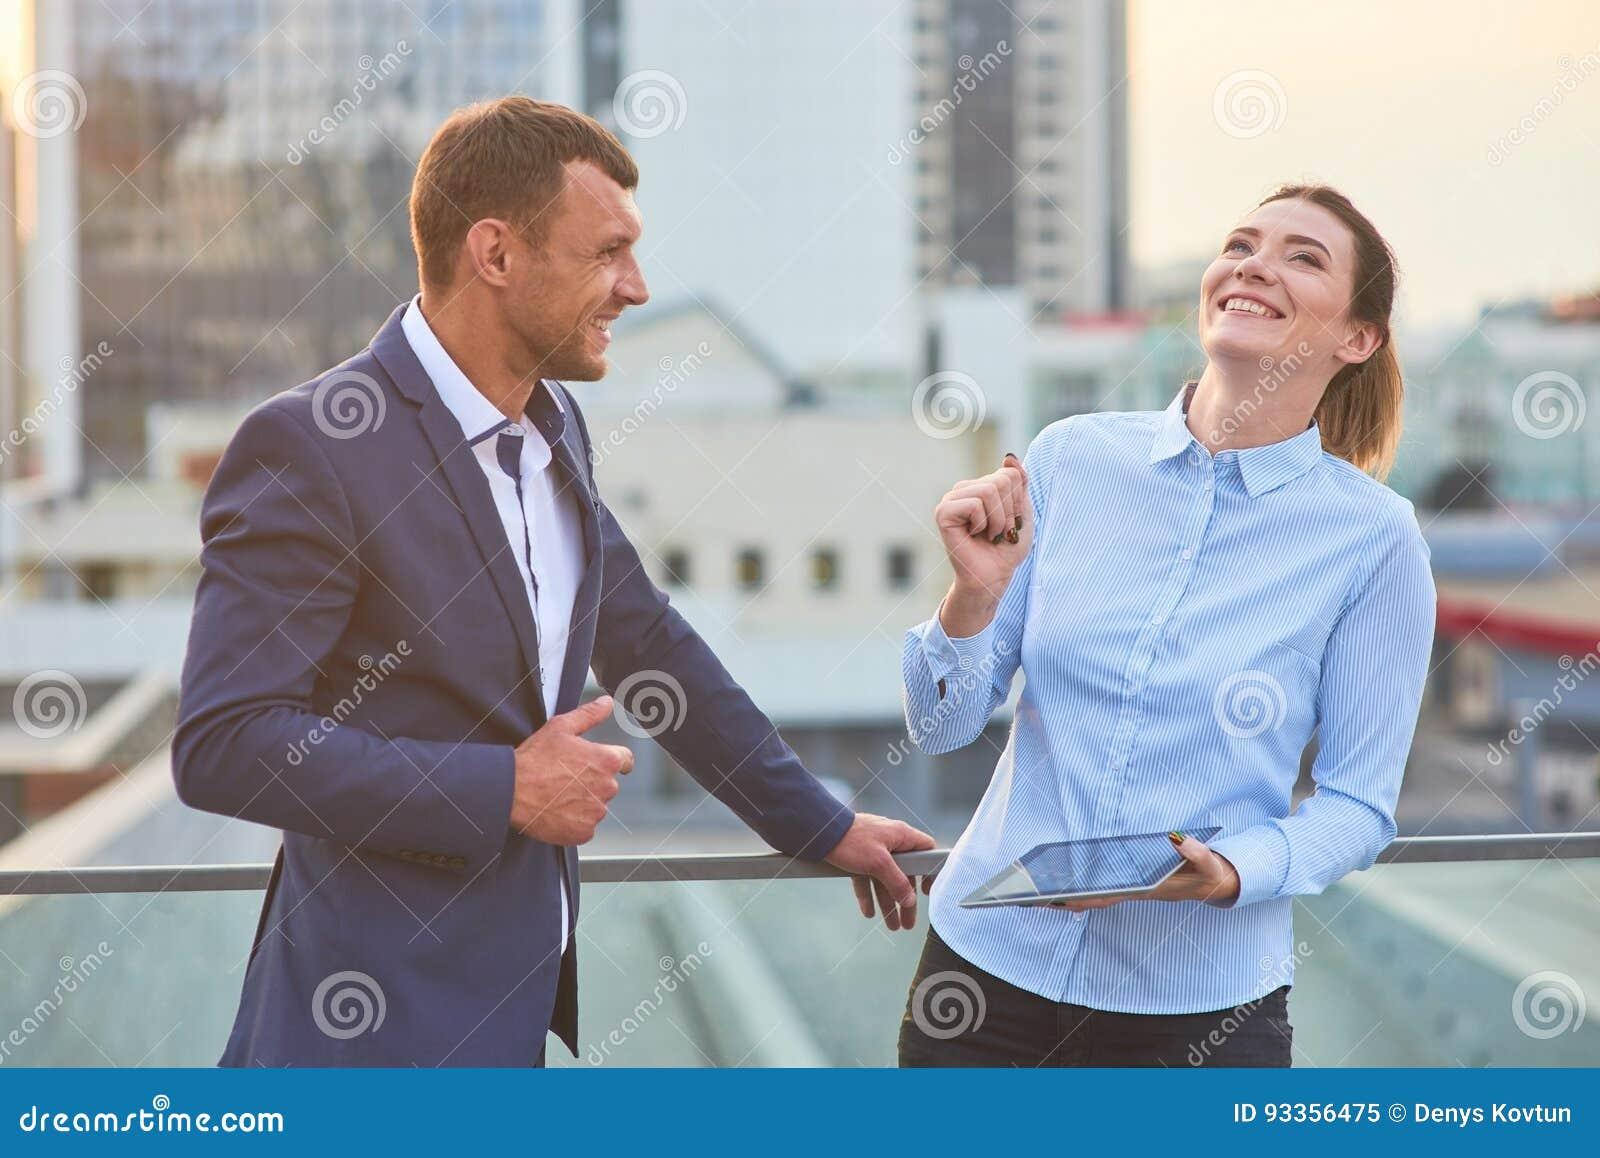 Business people handshake greeting deal at work photo free download - Business People Handshake Greeting Deal At Work Photo Free Download 41